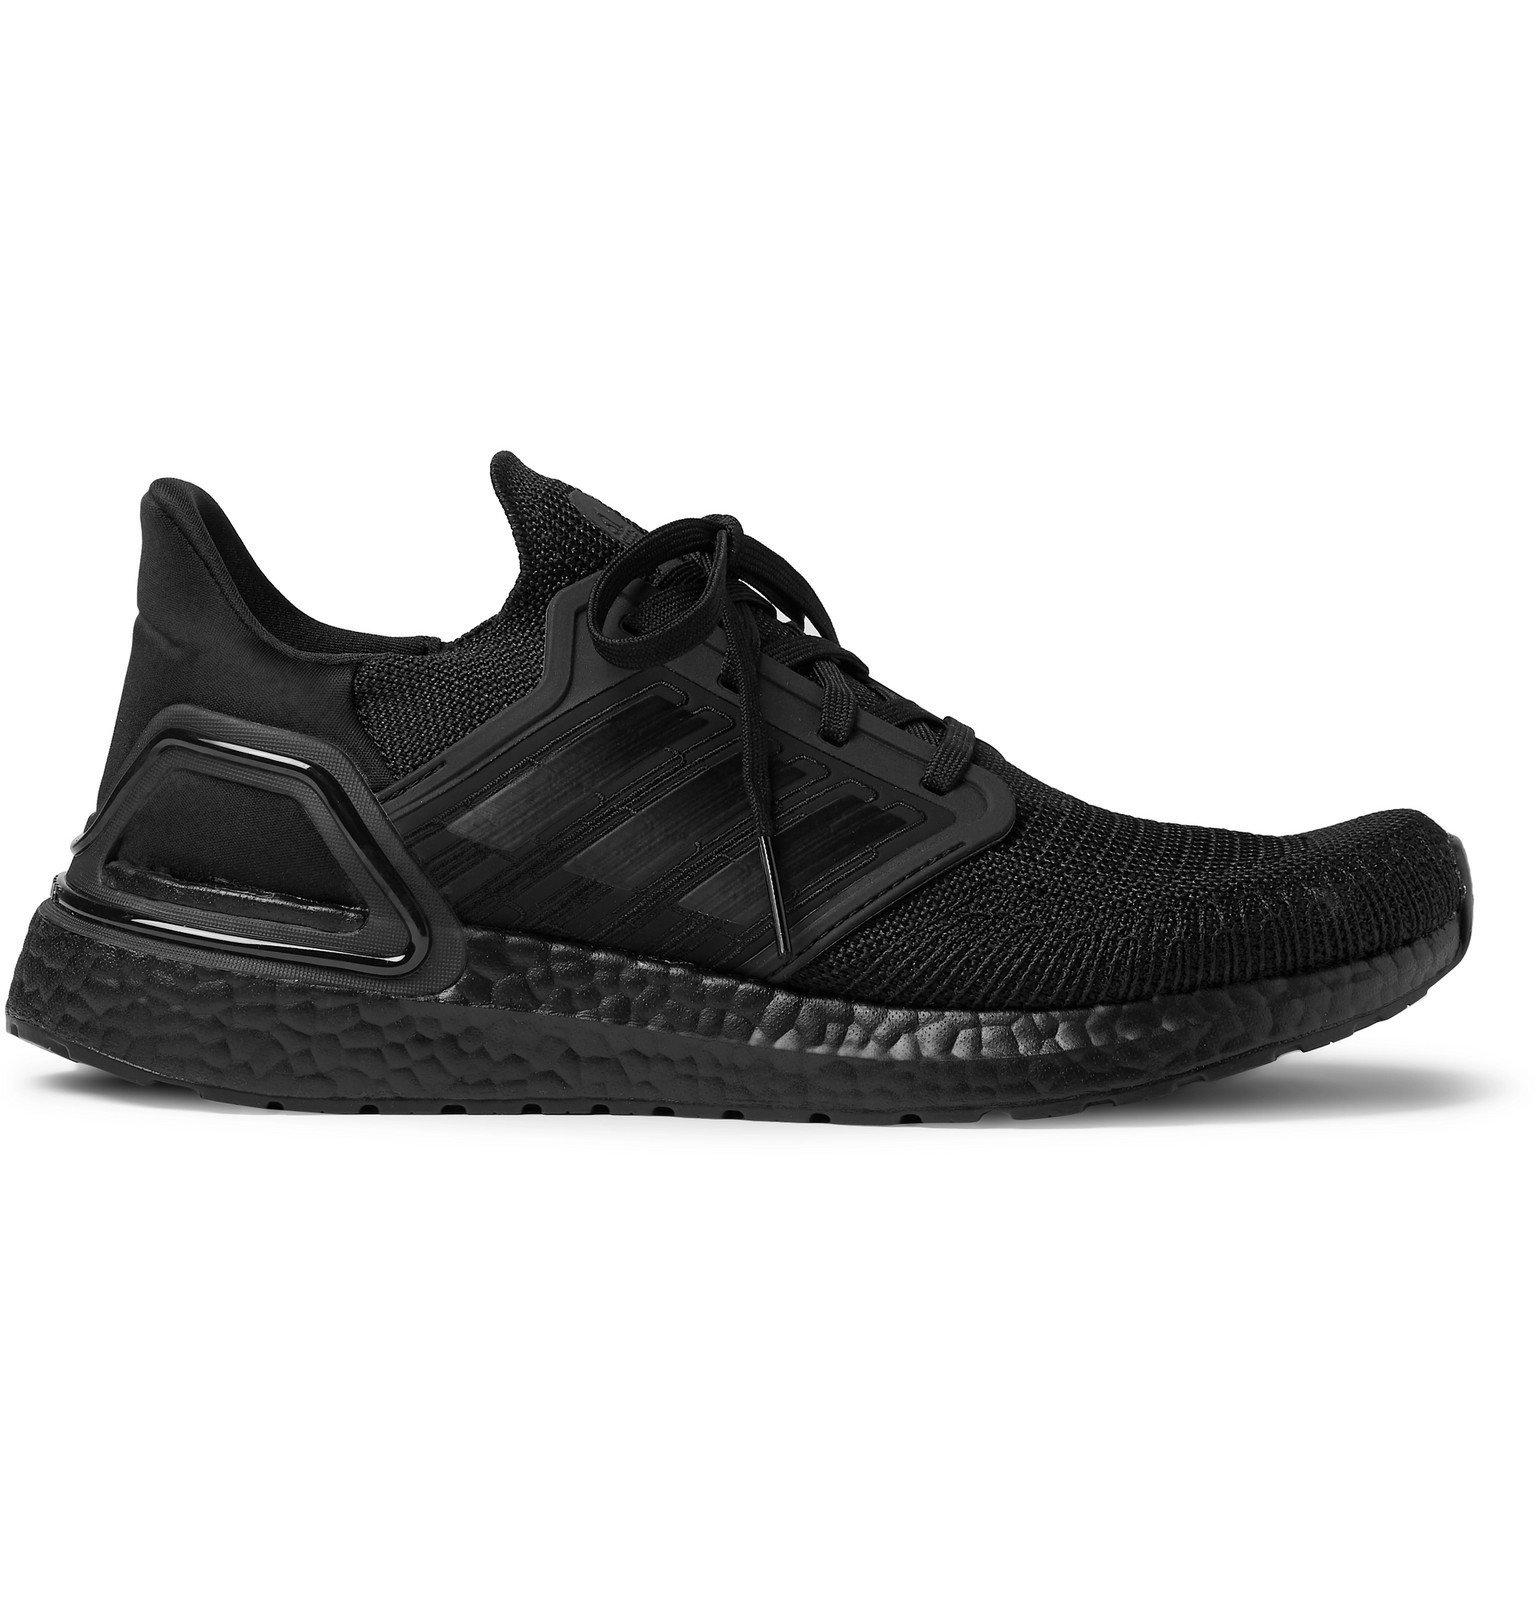 Photo: Adidas Sport - UltraBOOST 20 Rubber-Trimmed Primeknit Running Sneakers - Black